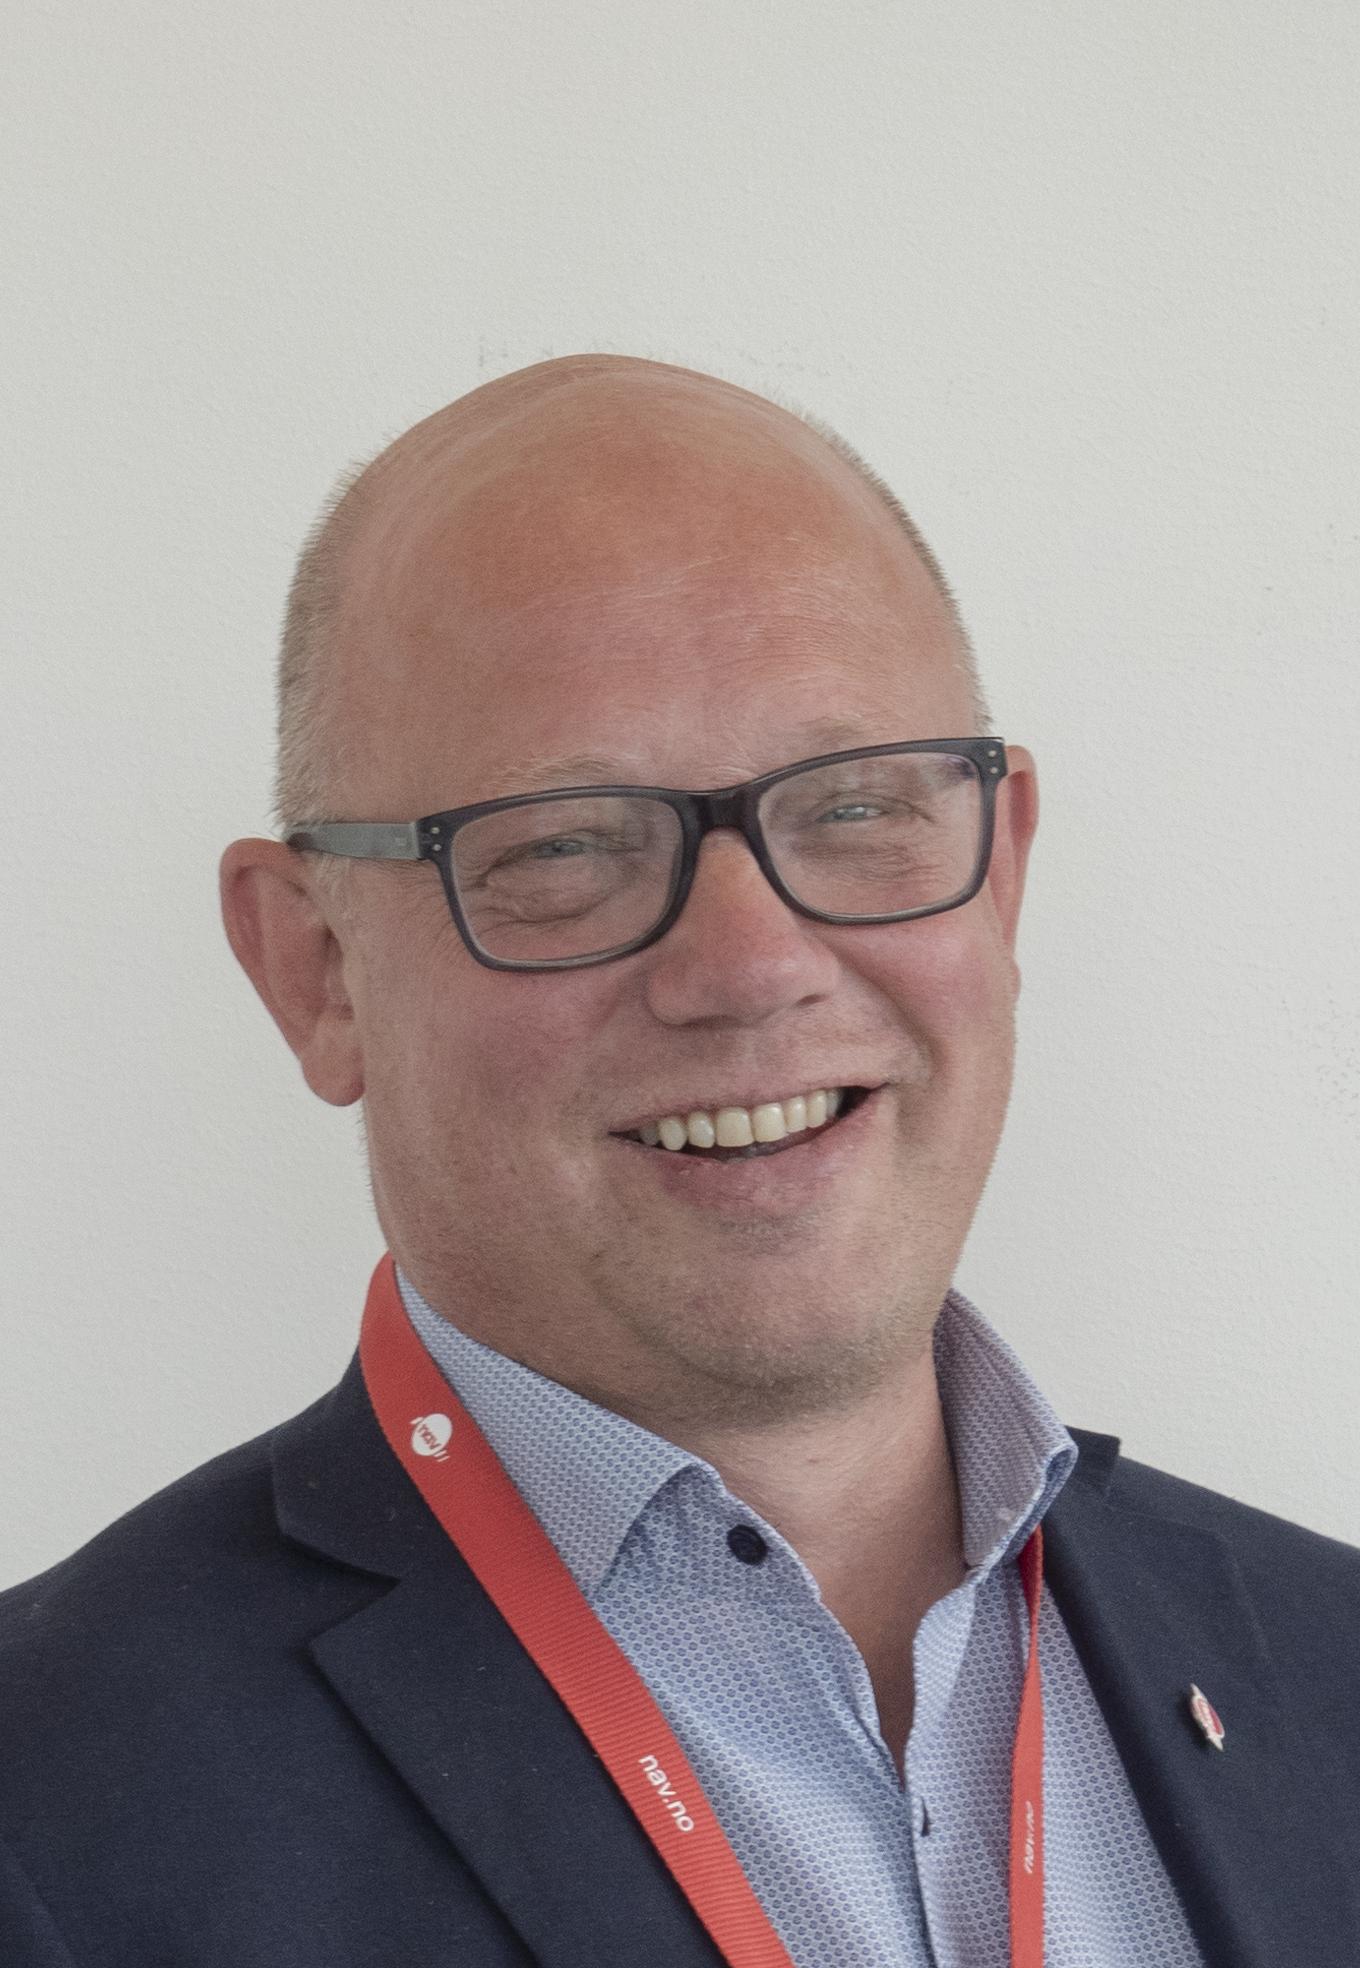 Ola Løvold, Markedskoordinator i NAV Møre og Romsdall